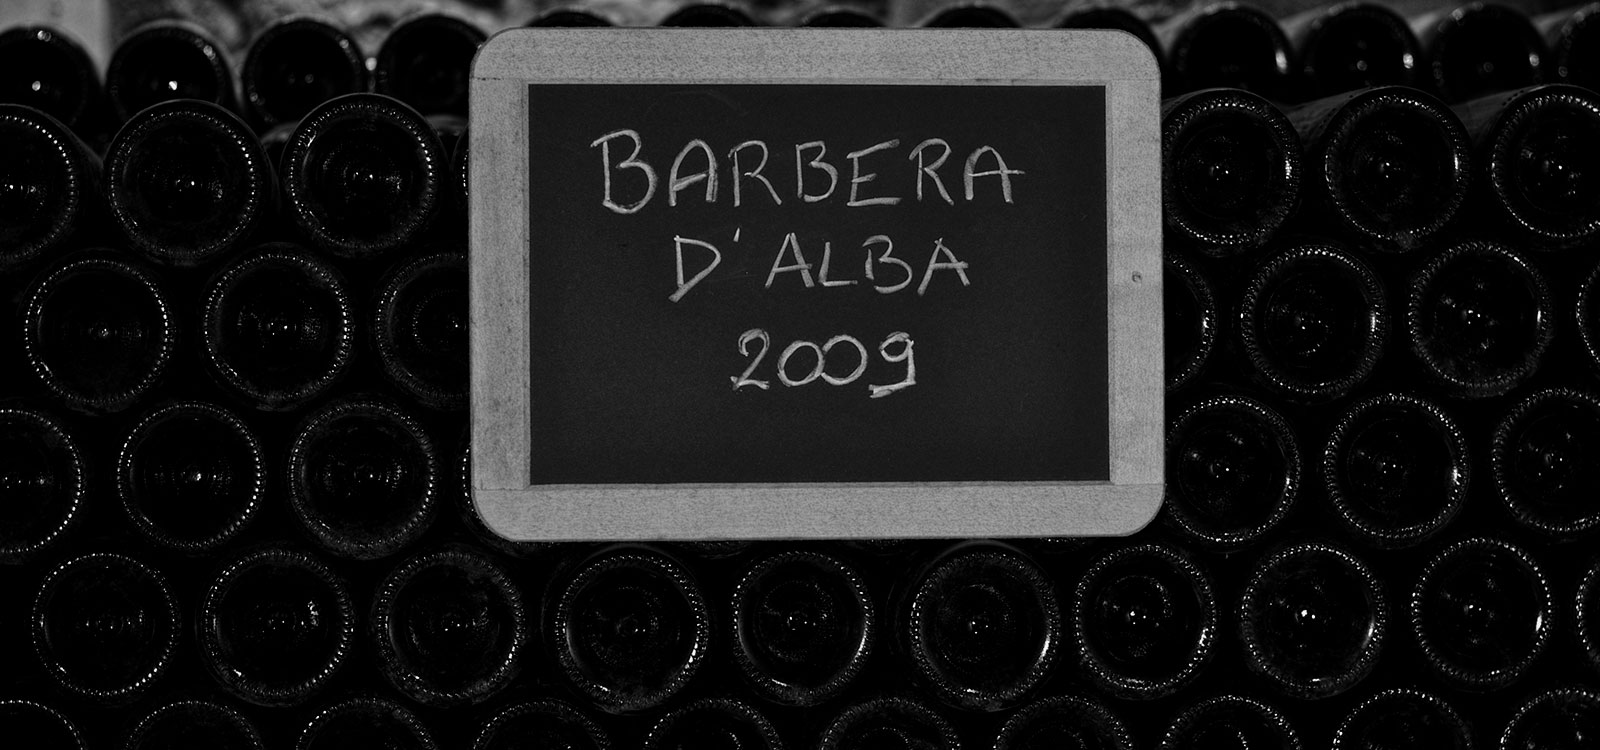 Barbera d'Alba